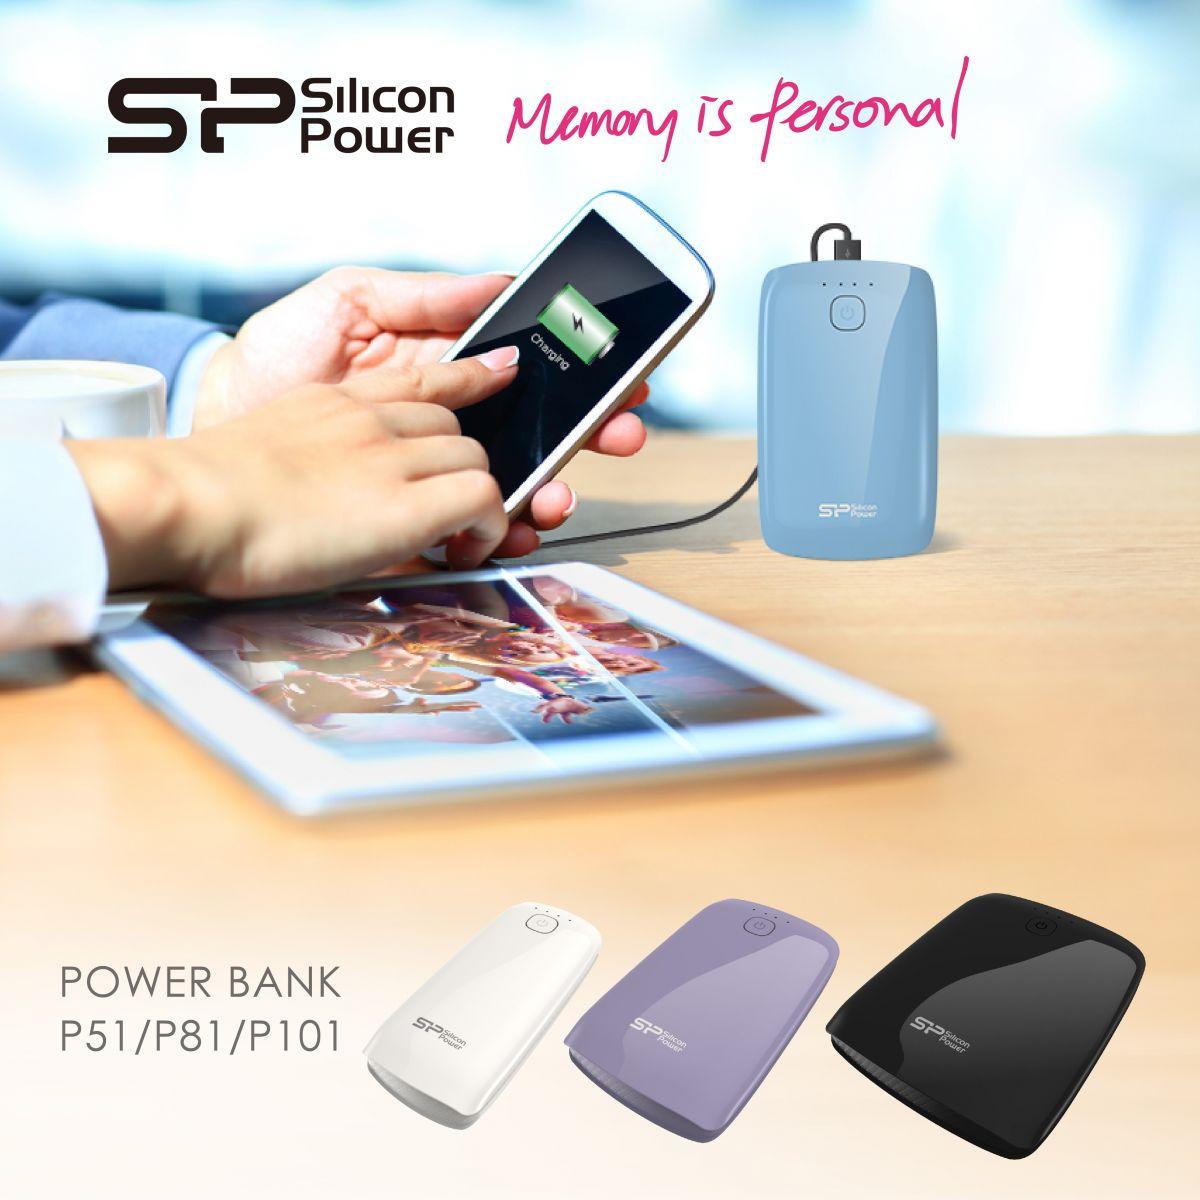 Power Bank- Power P51, Power P81 And Power P101